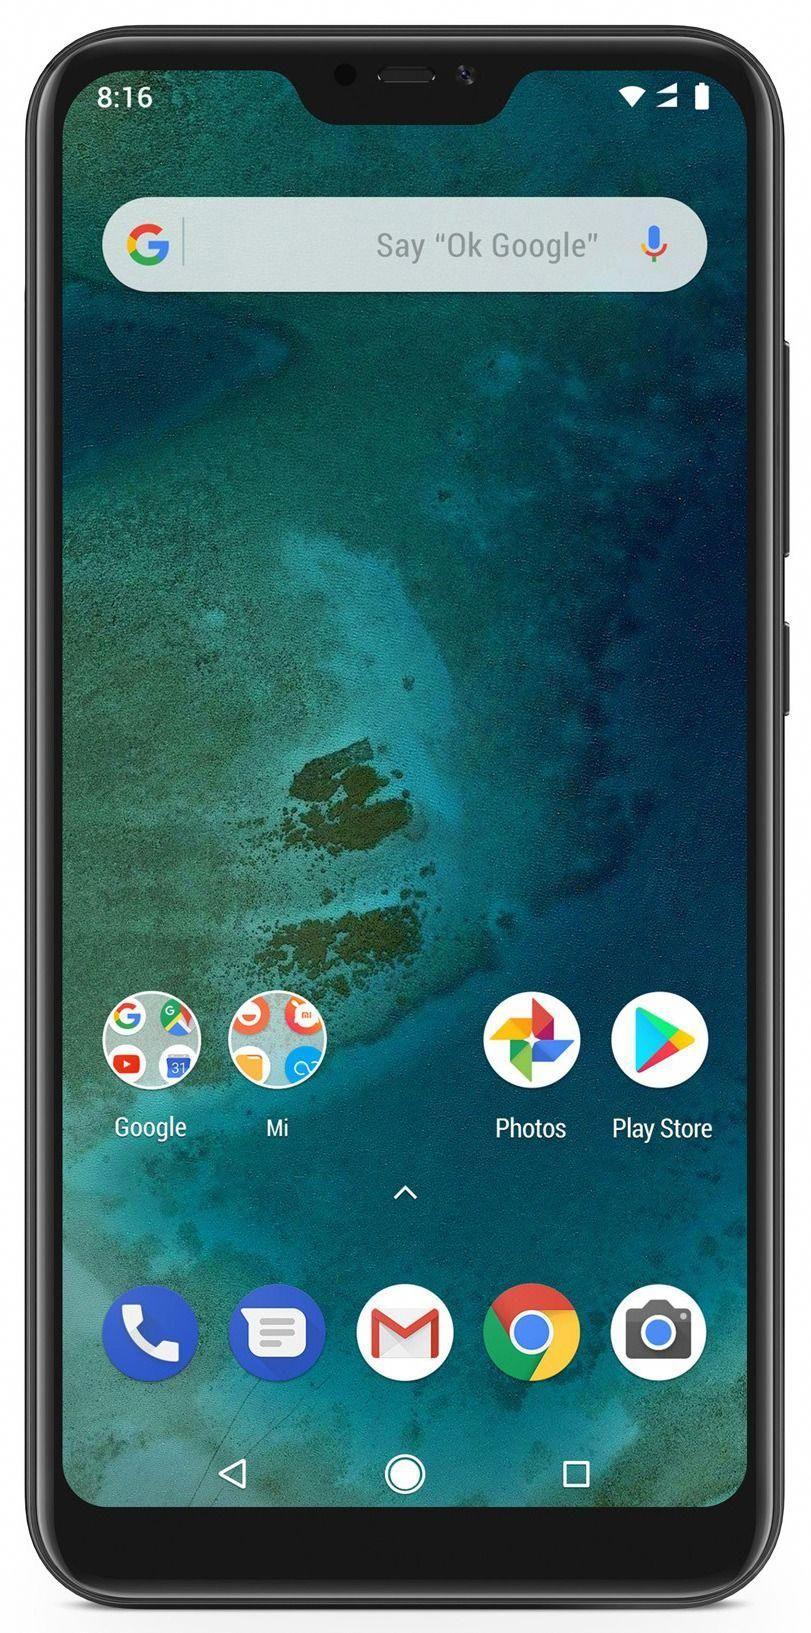 My Iphone Wont Turn On Ipadsplitscreen Favouritesmartphone Iphone Wallpaper Inspirational Iphone Wallpaper Hipster Xiaomi